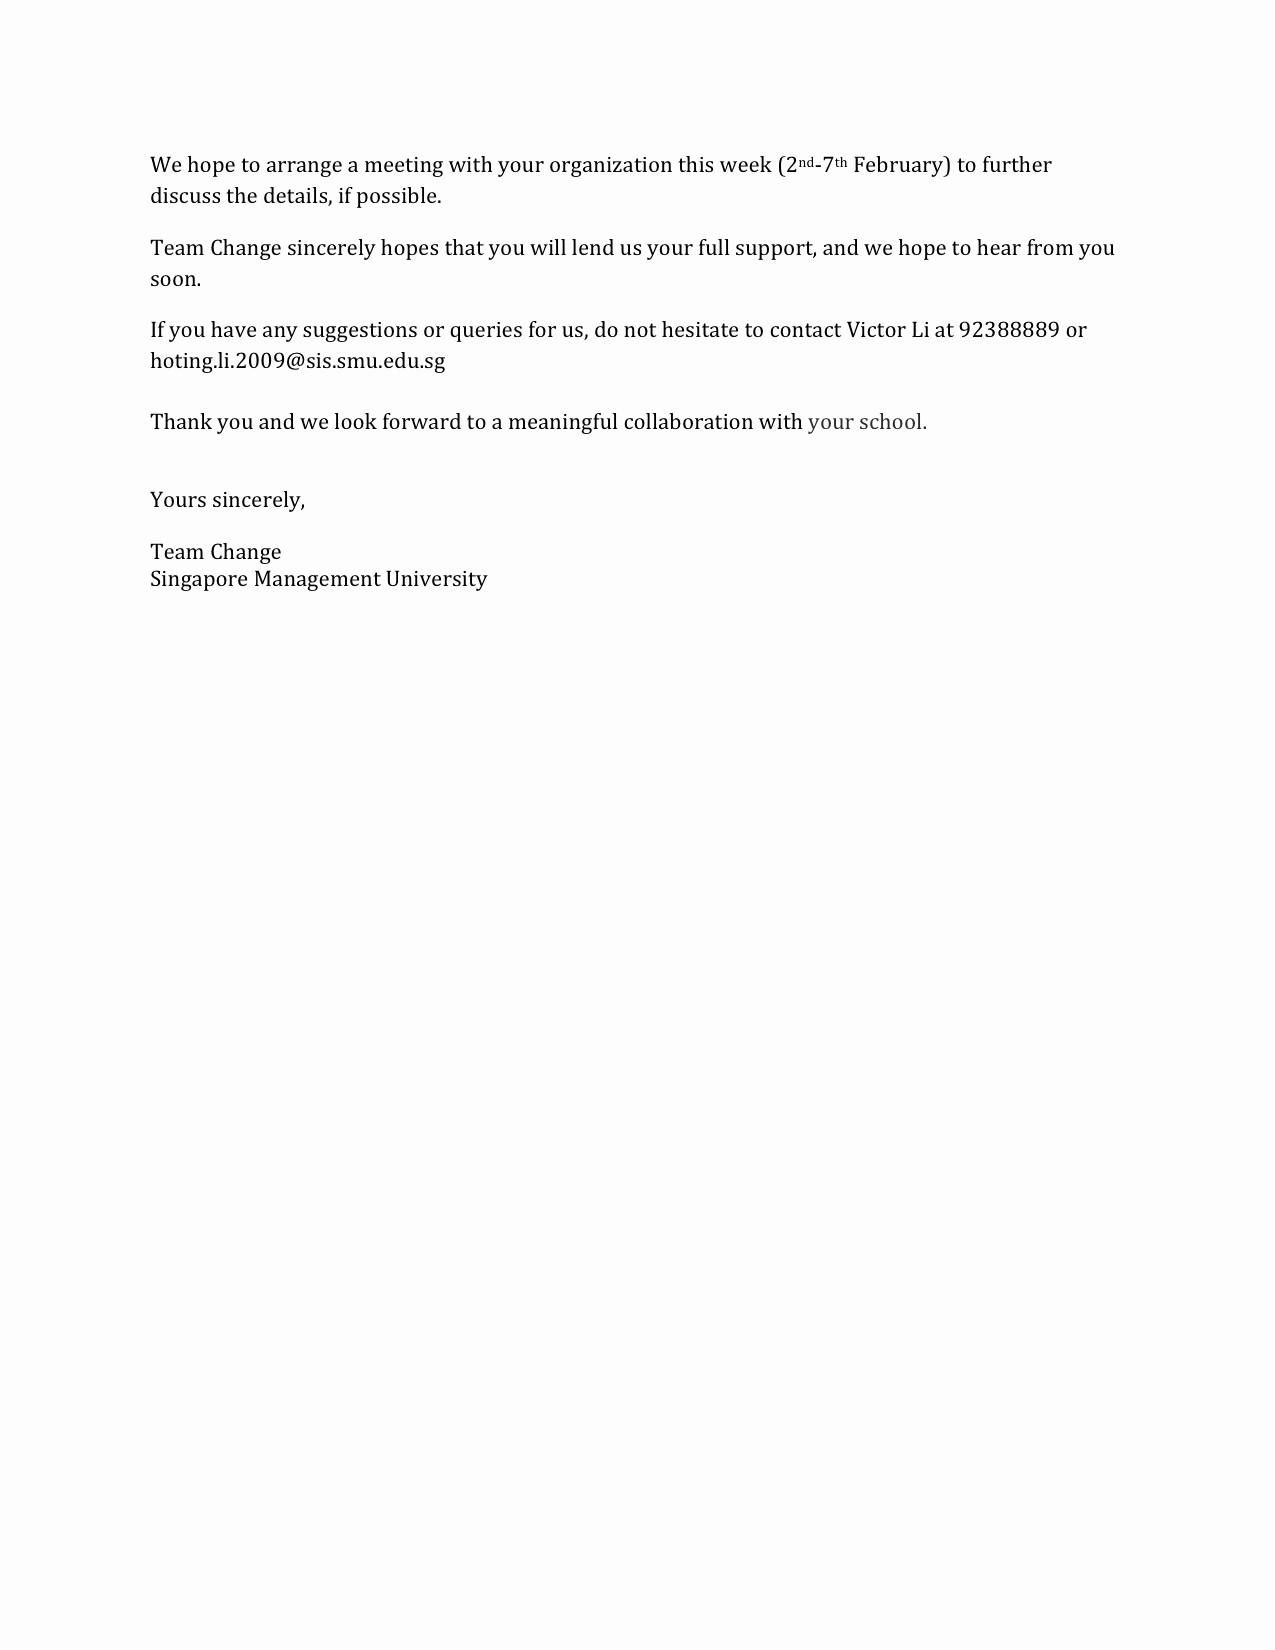 Sample Letter Of Reimbursement Money Luxury Letter Of Intent to Greendale Secondary School